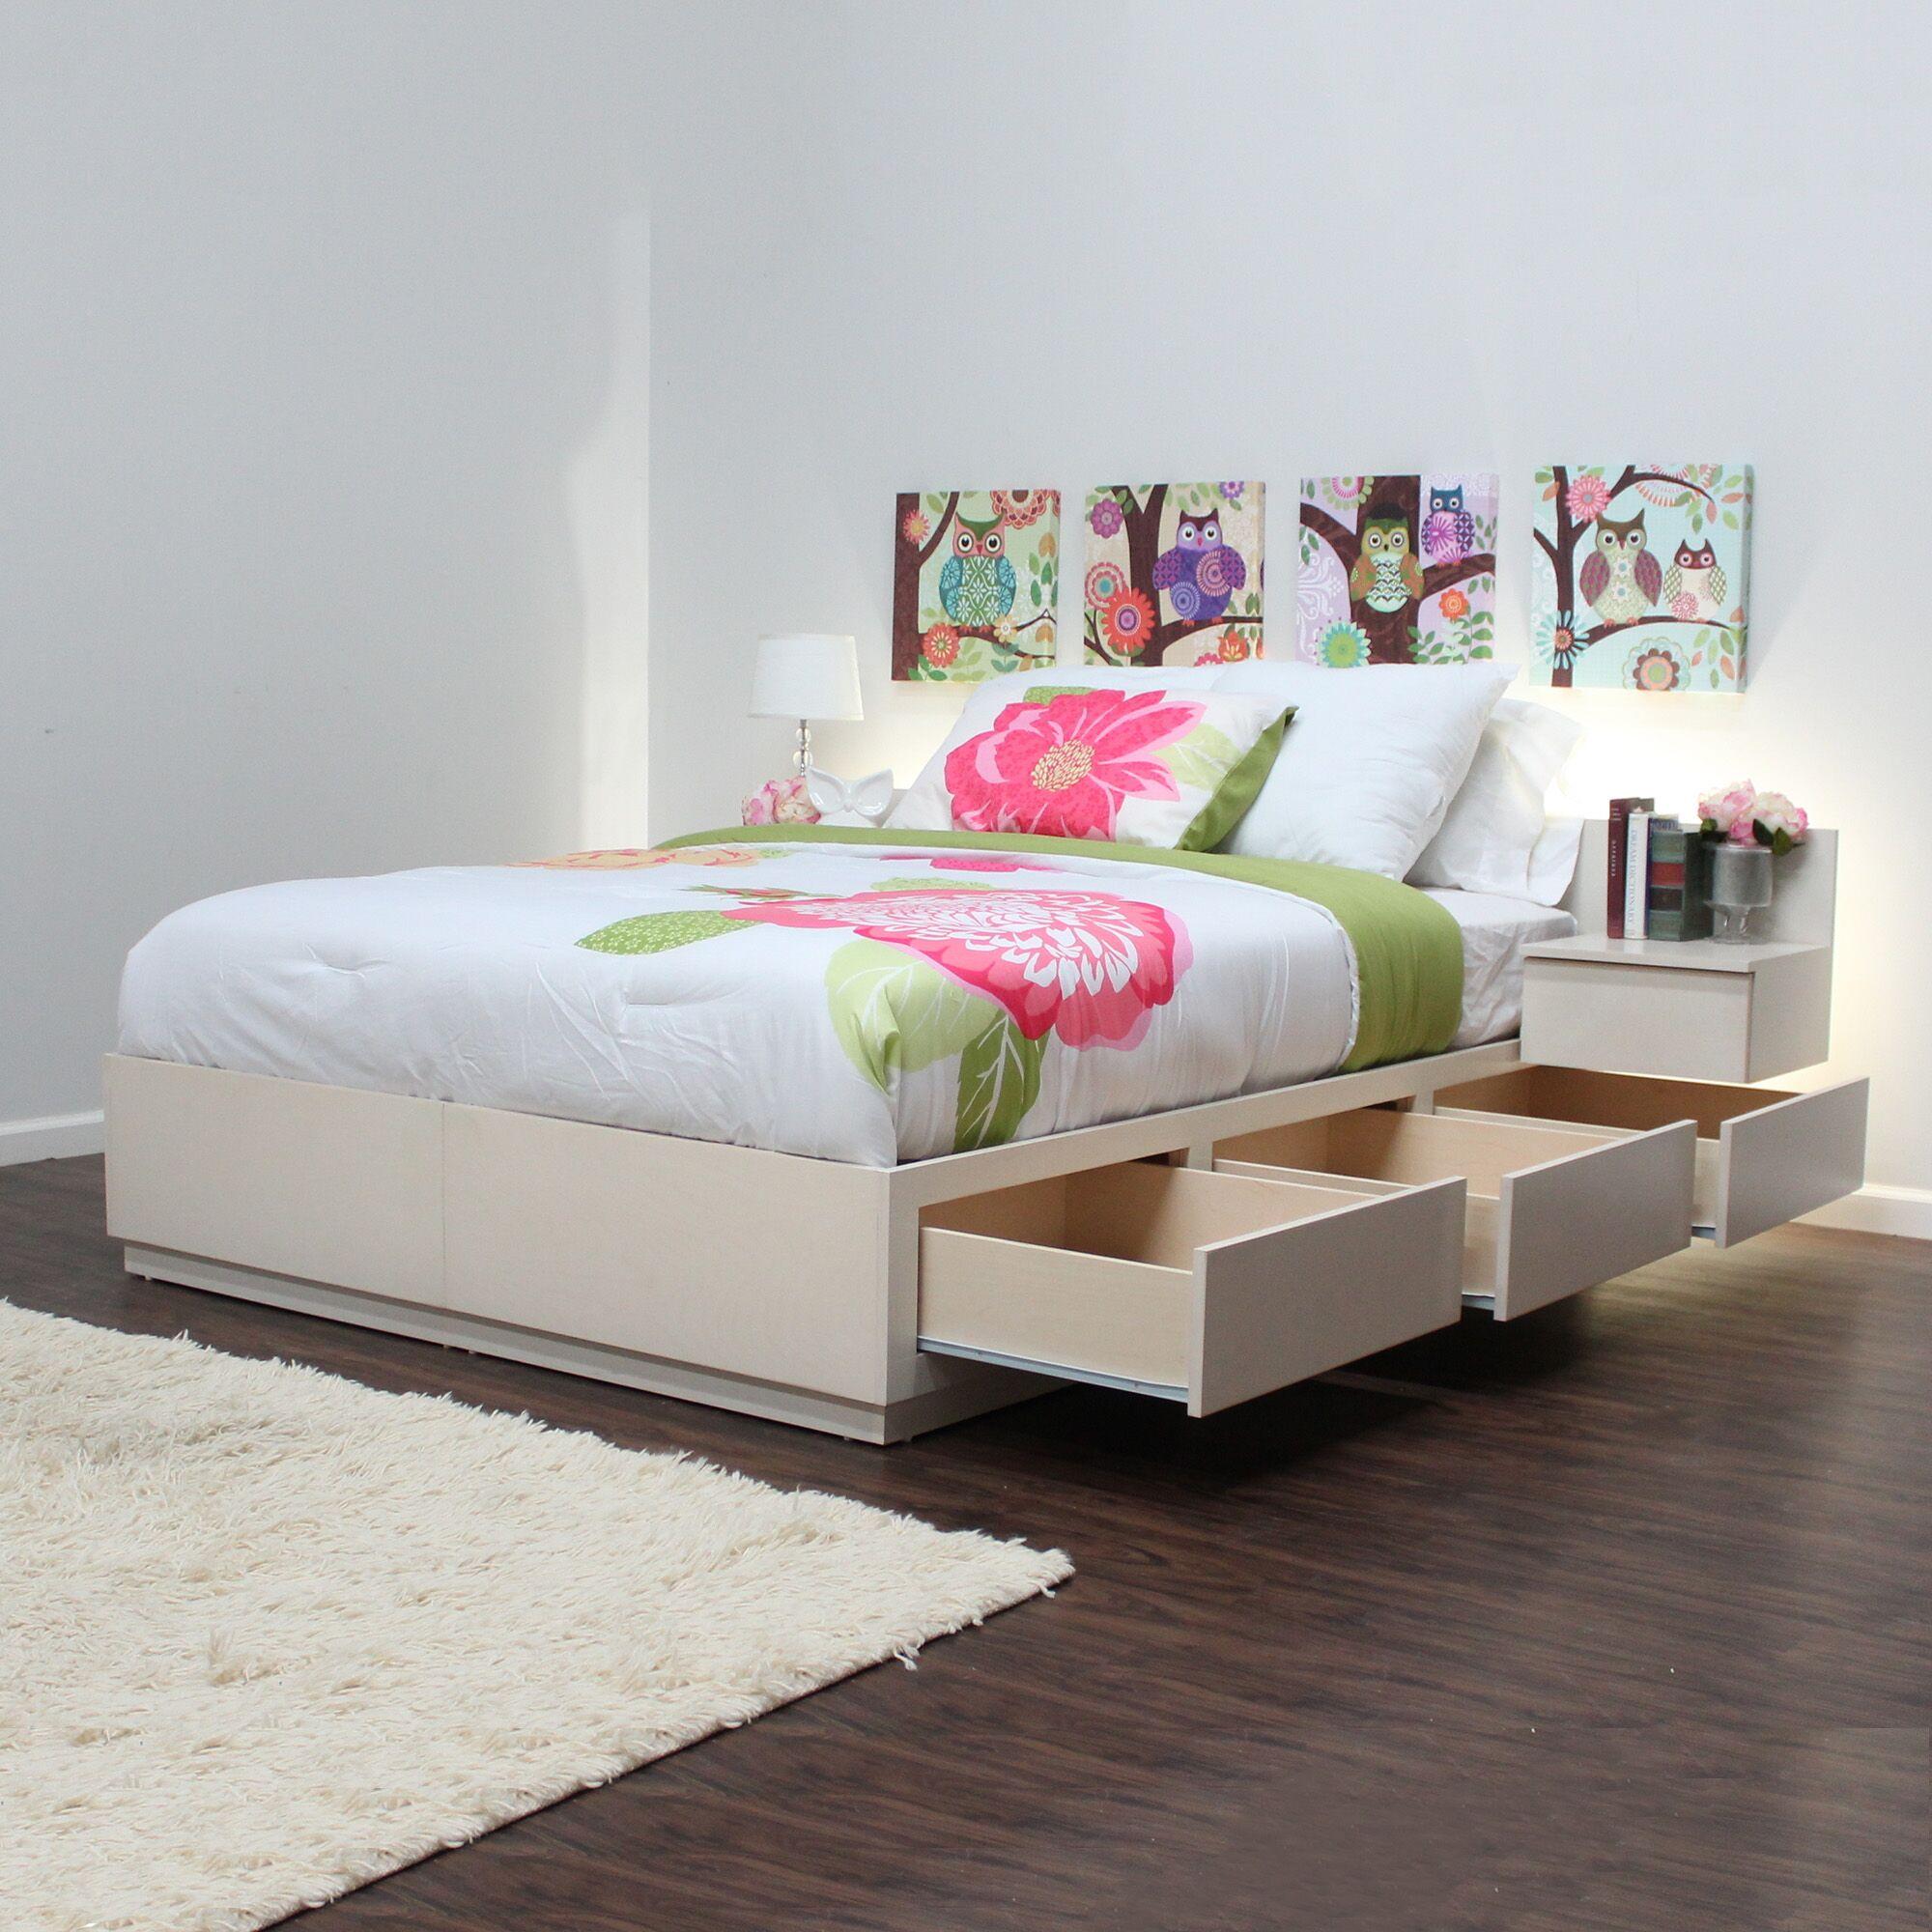 Captains Storage Platform Bed Color: Unfinished, Size: Queen